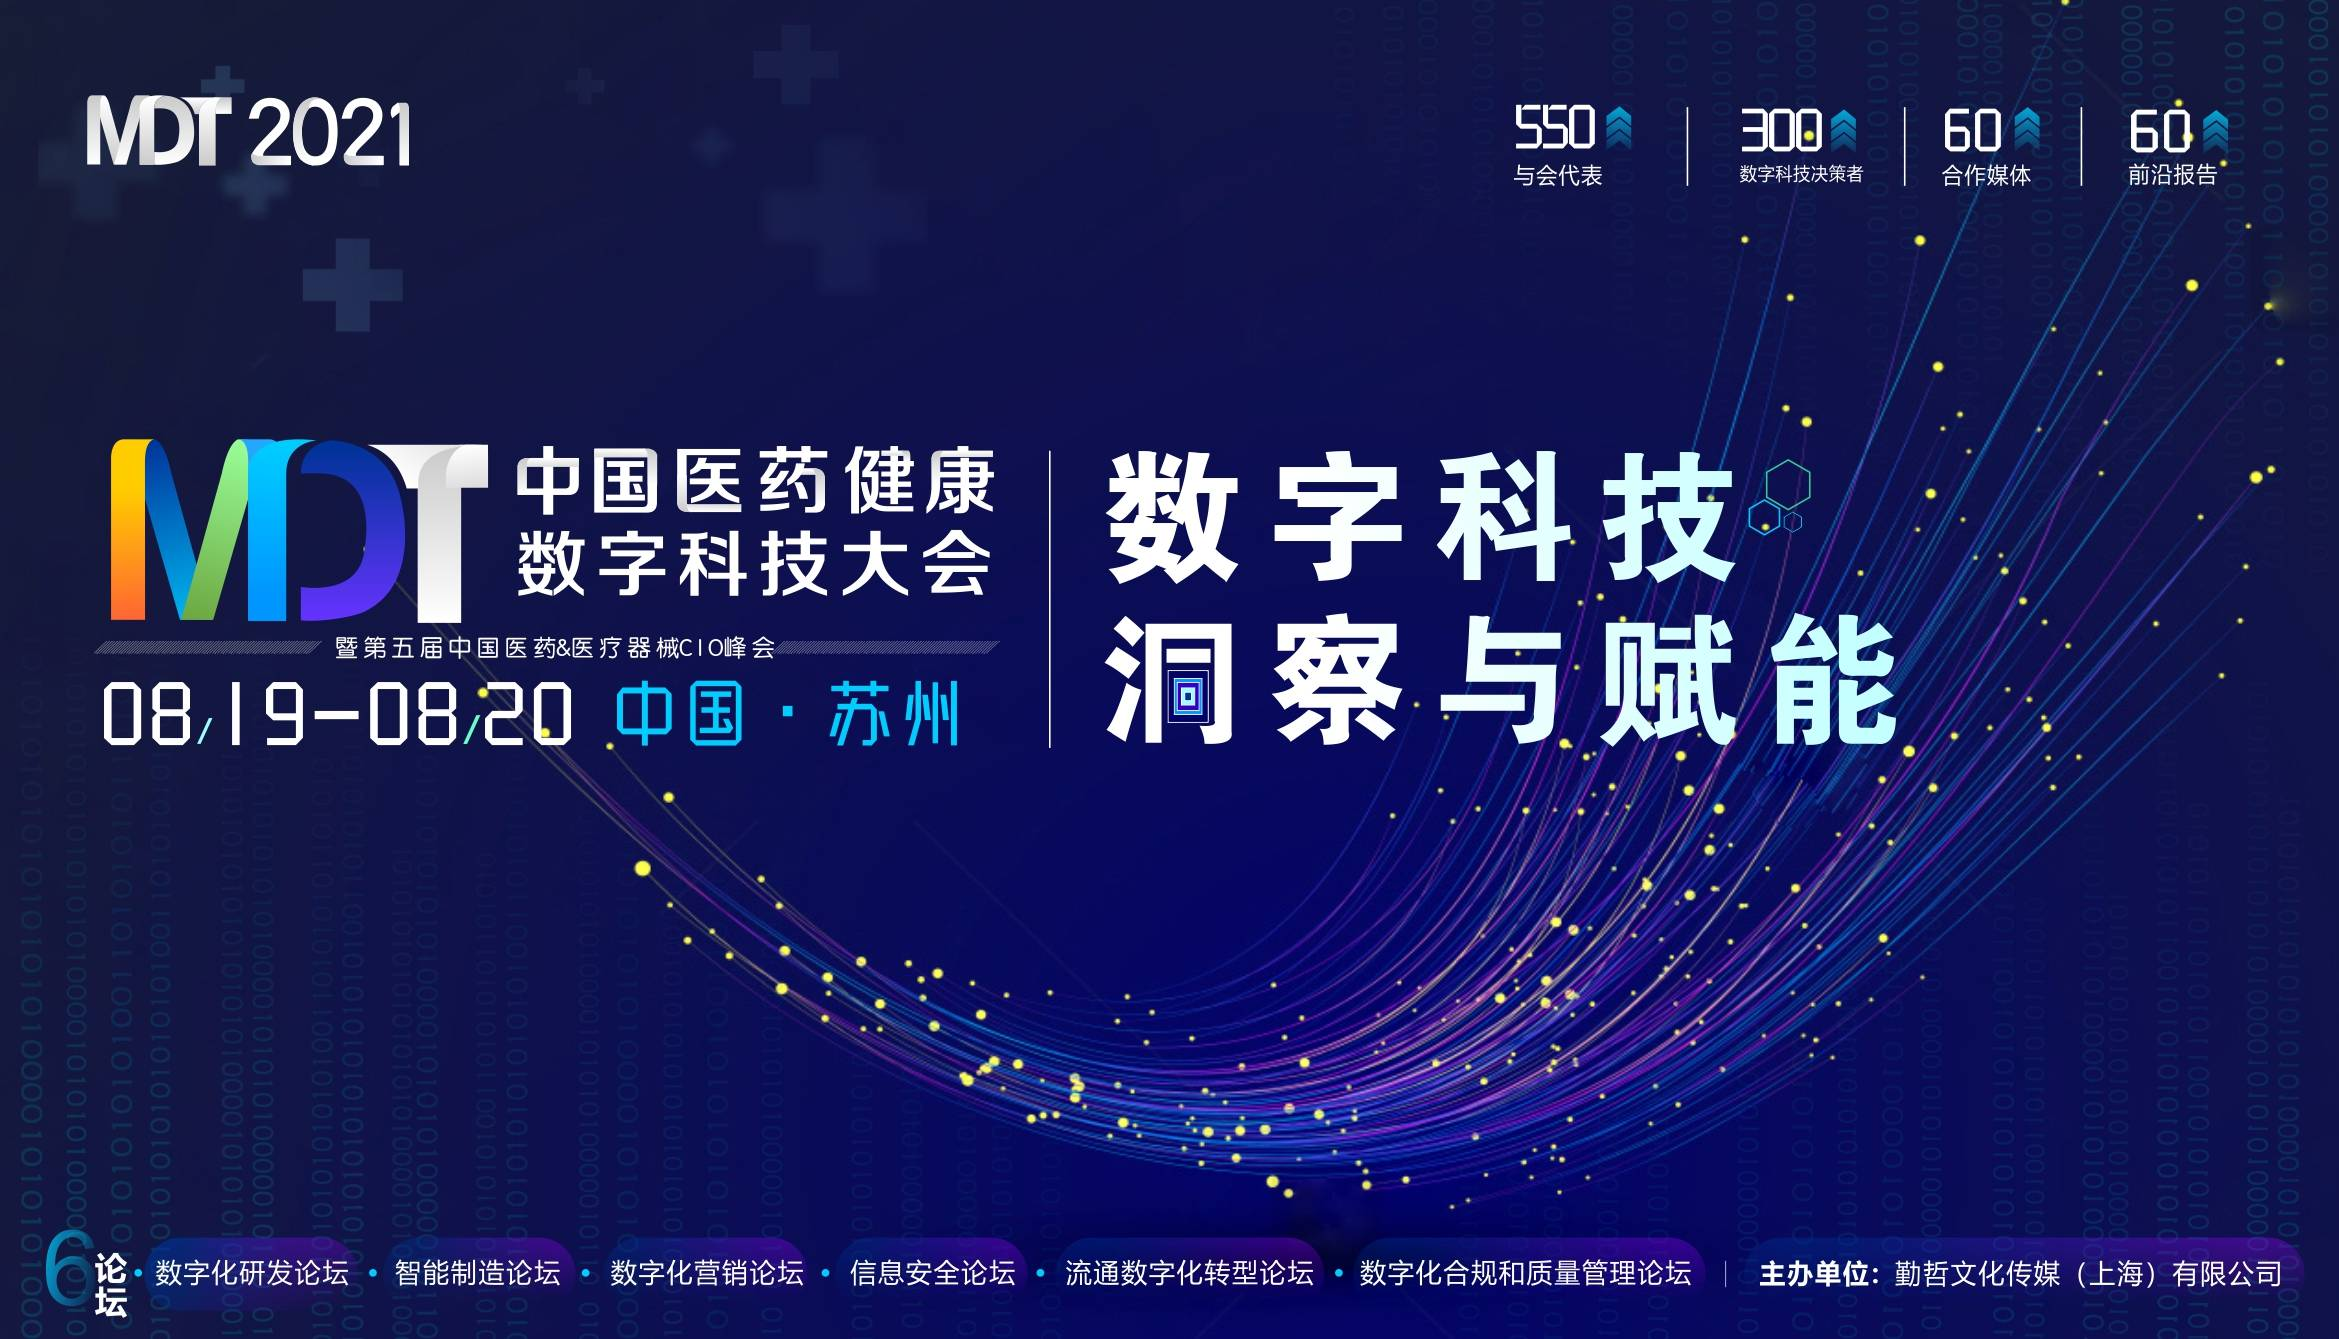 MDT2021中国医药健康数字科技大会